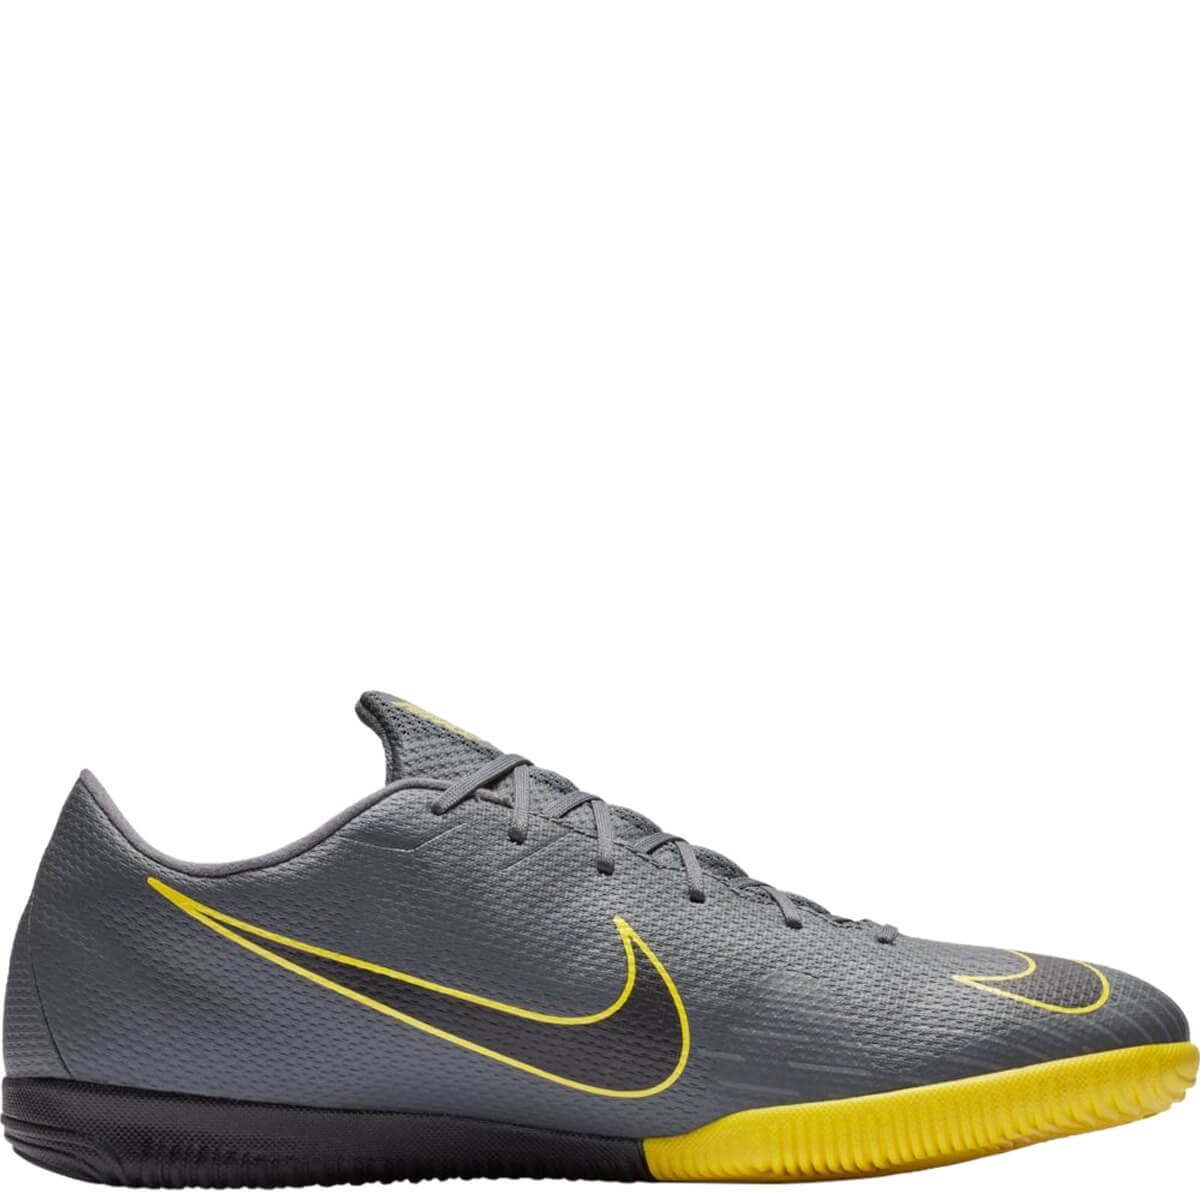 c652aa428 Chuteira Masculina Futsal Nike Vapor XII Academy Ah7383-070 - Cinza/Amarelo  | Bizz Store